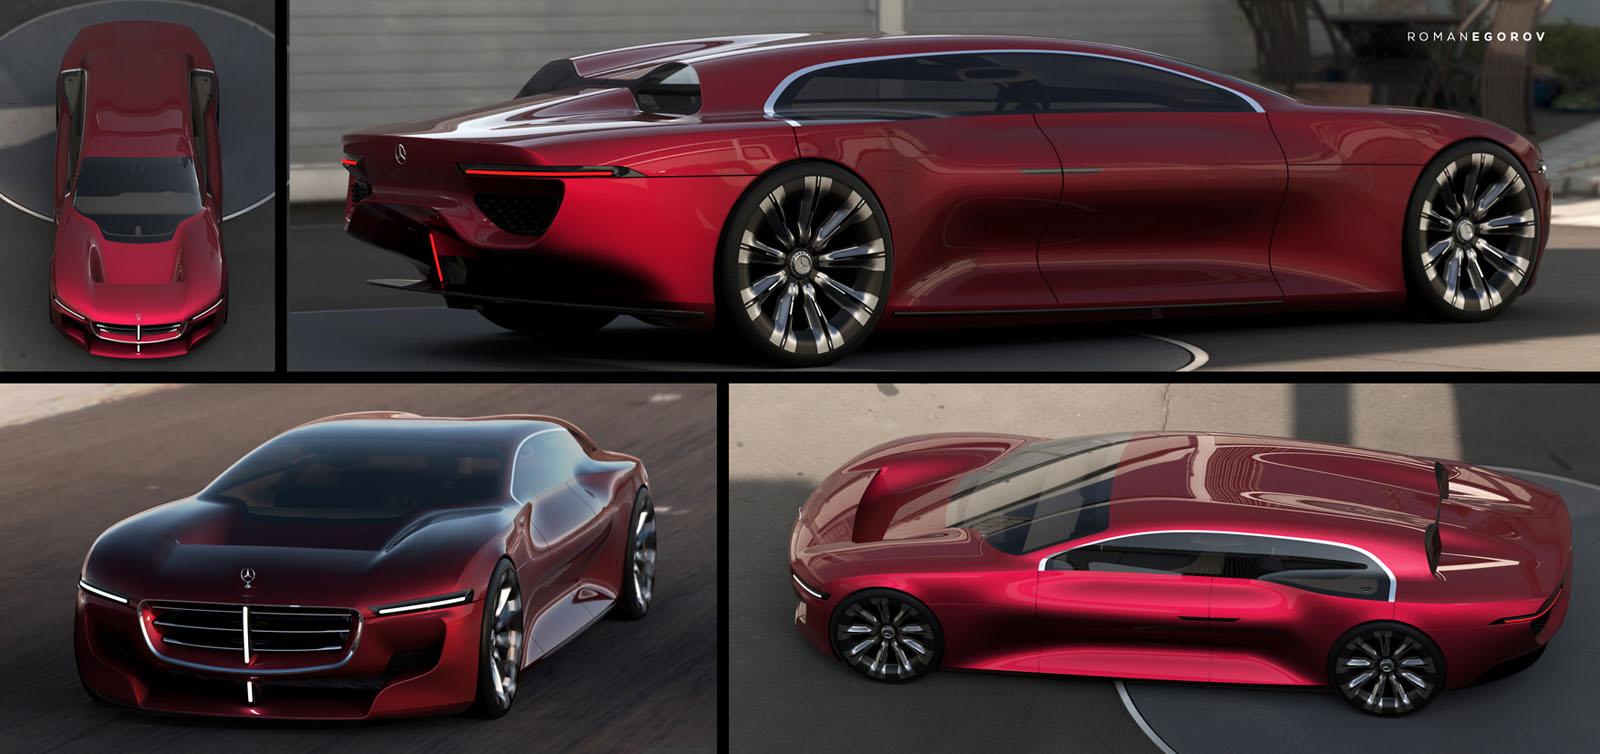 This Aerodynamic Mercedes-Benz Limousine Concept Aims To ...